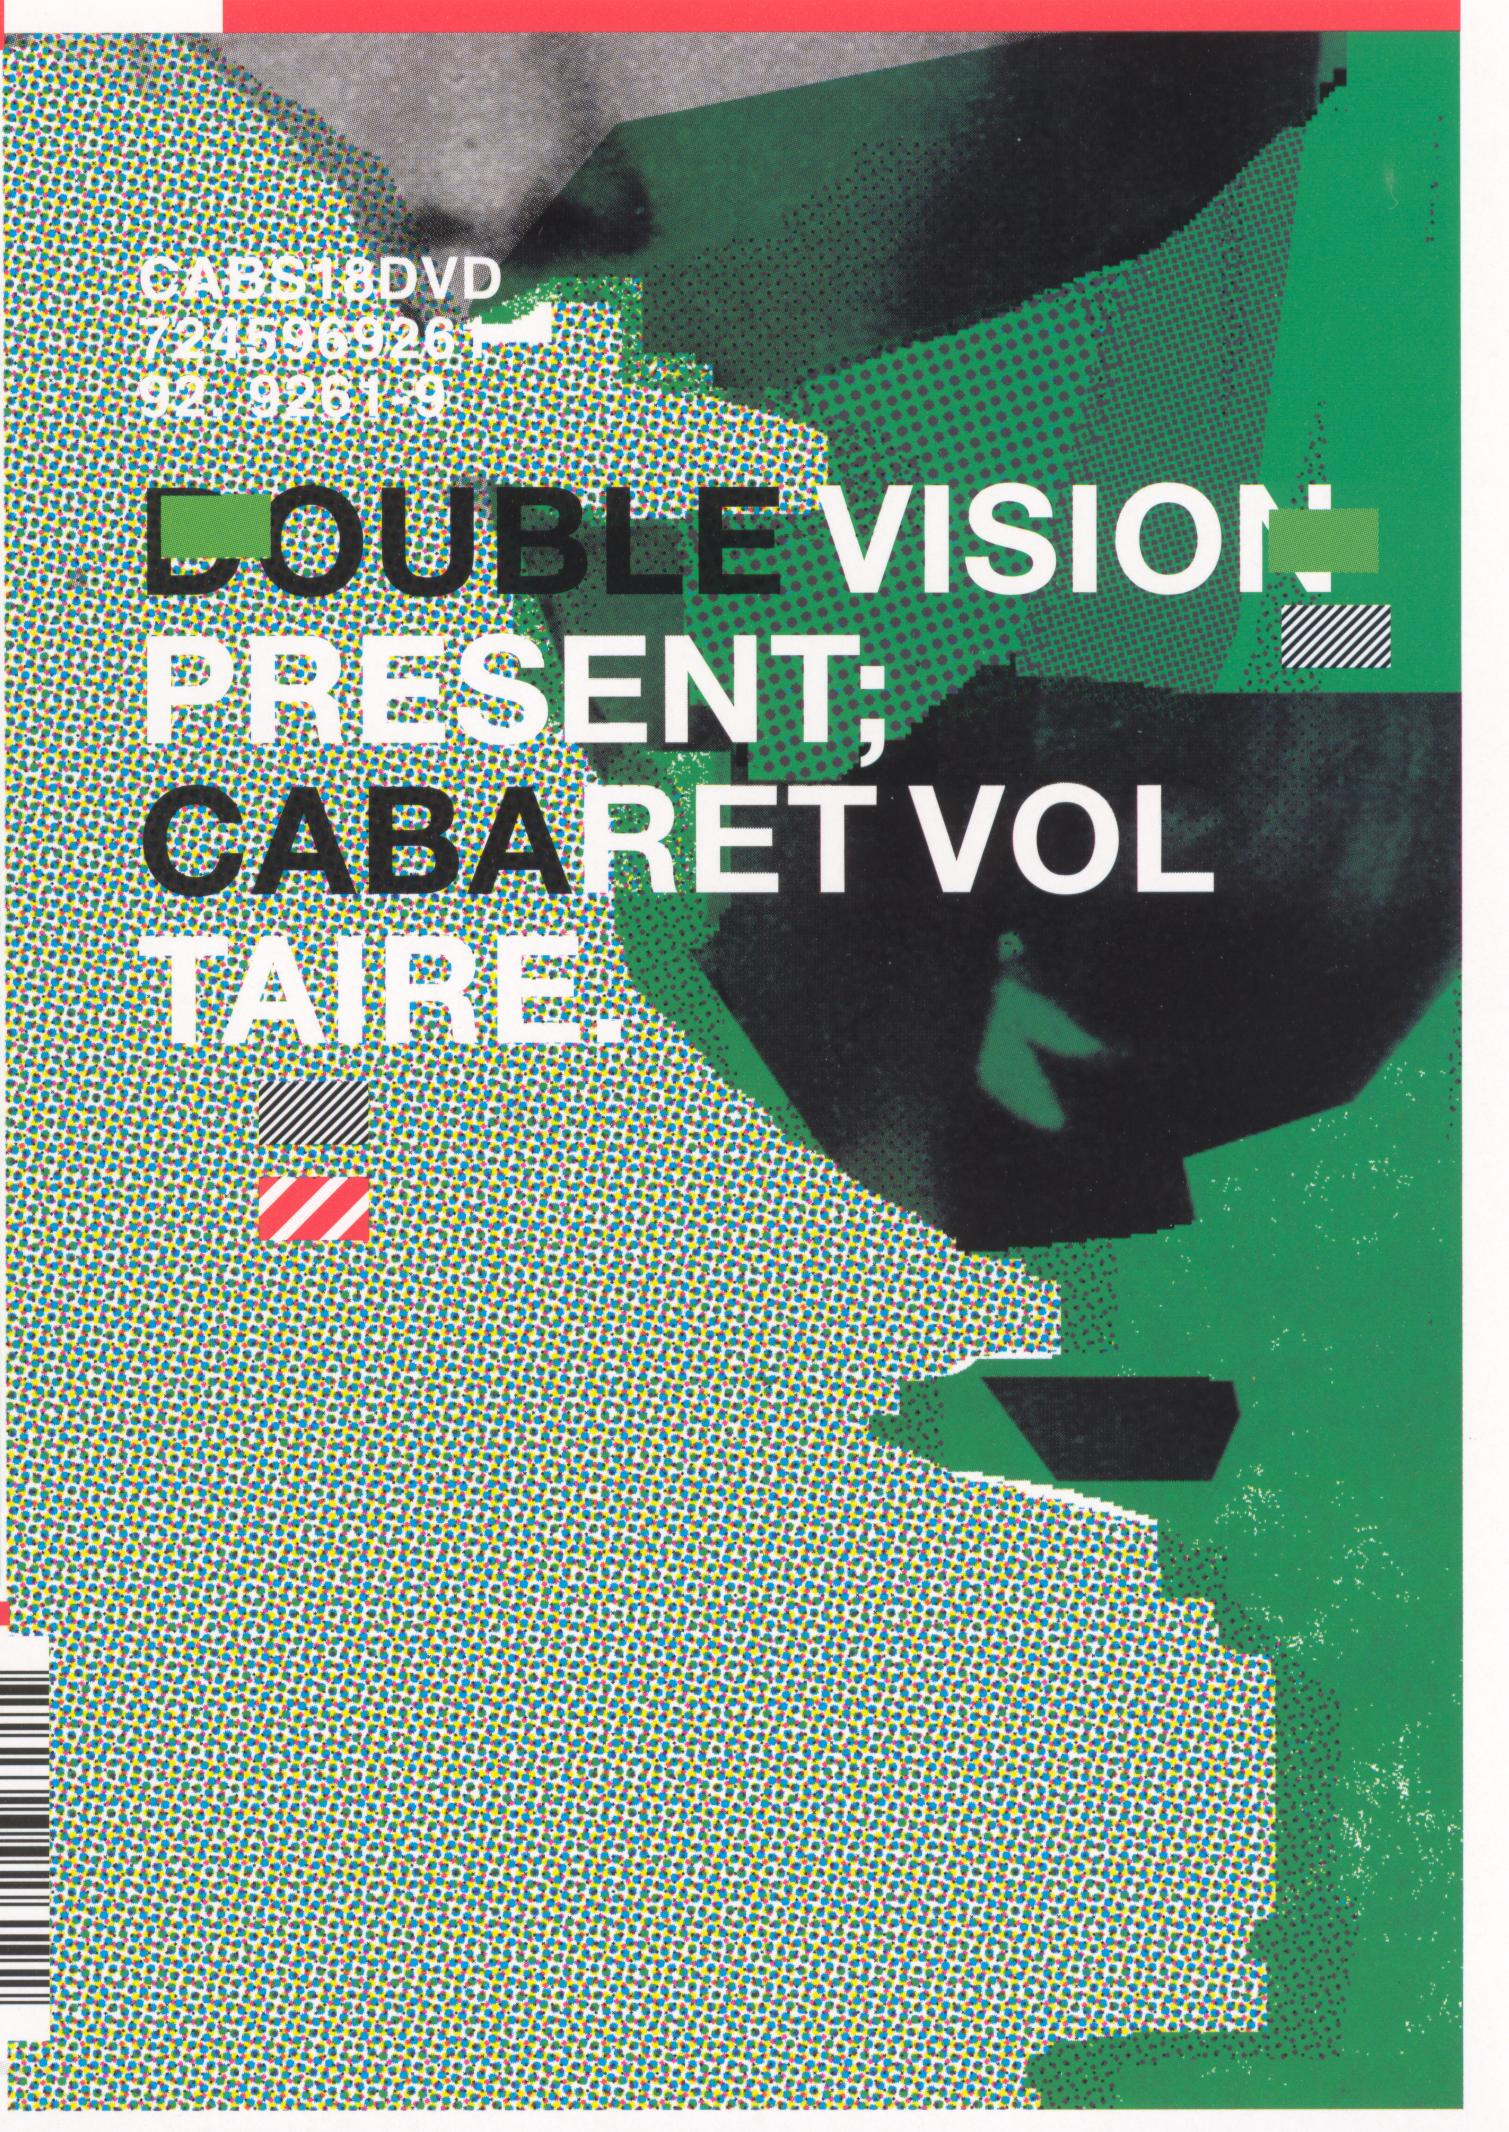 Double Vision Present; Cabaret Voltaire